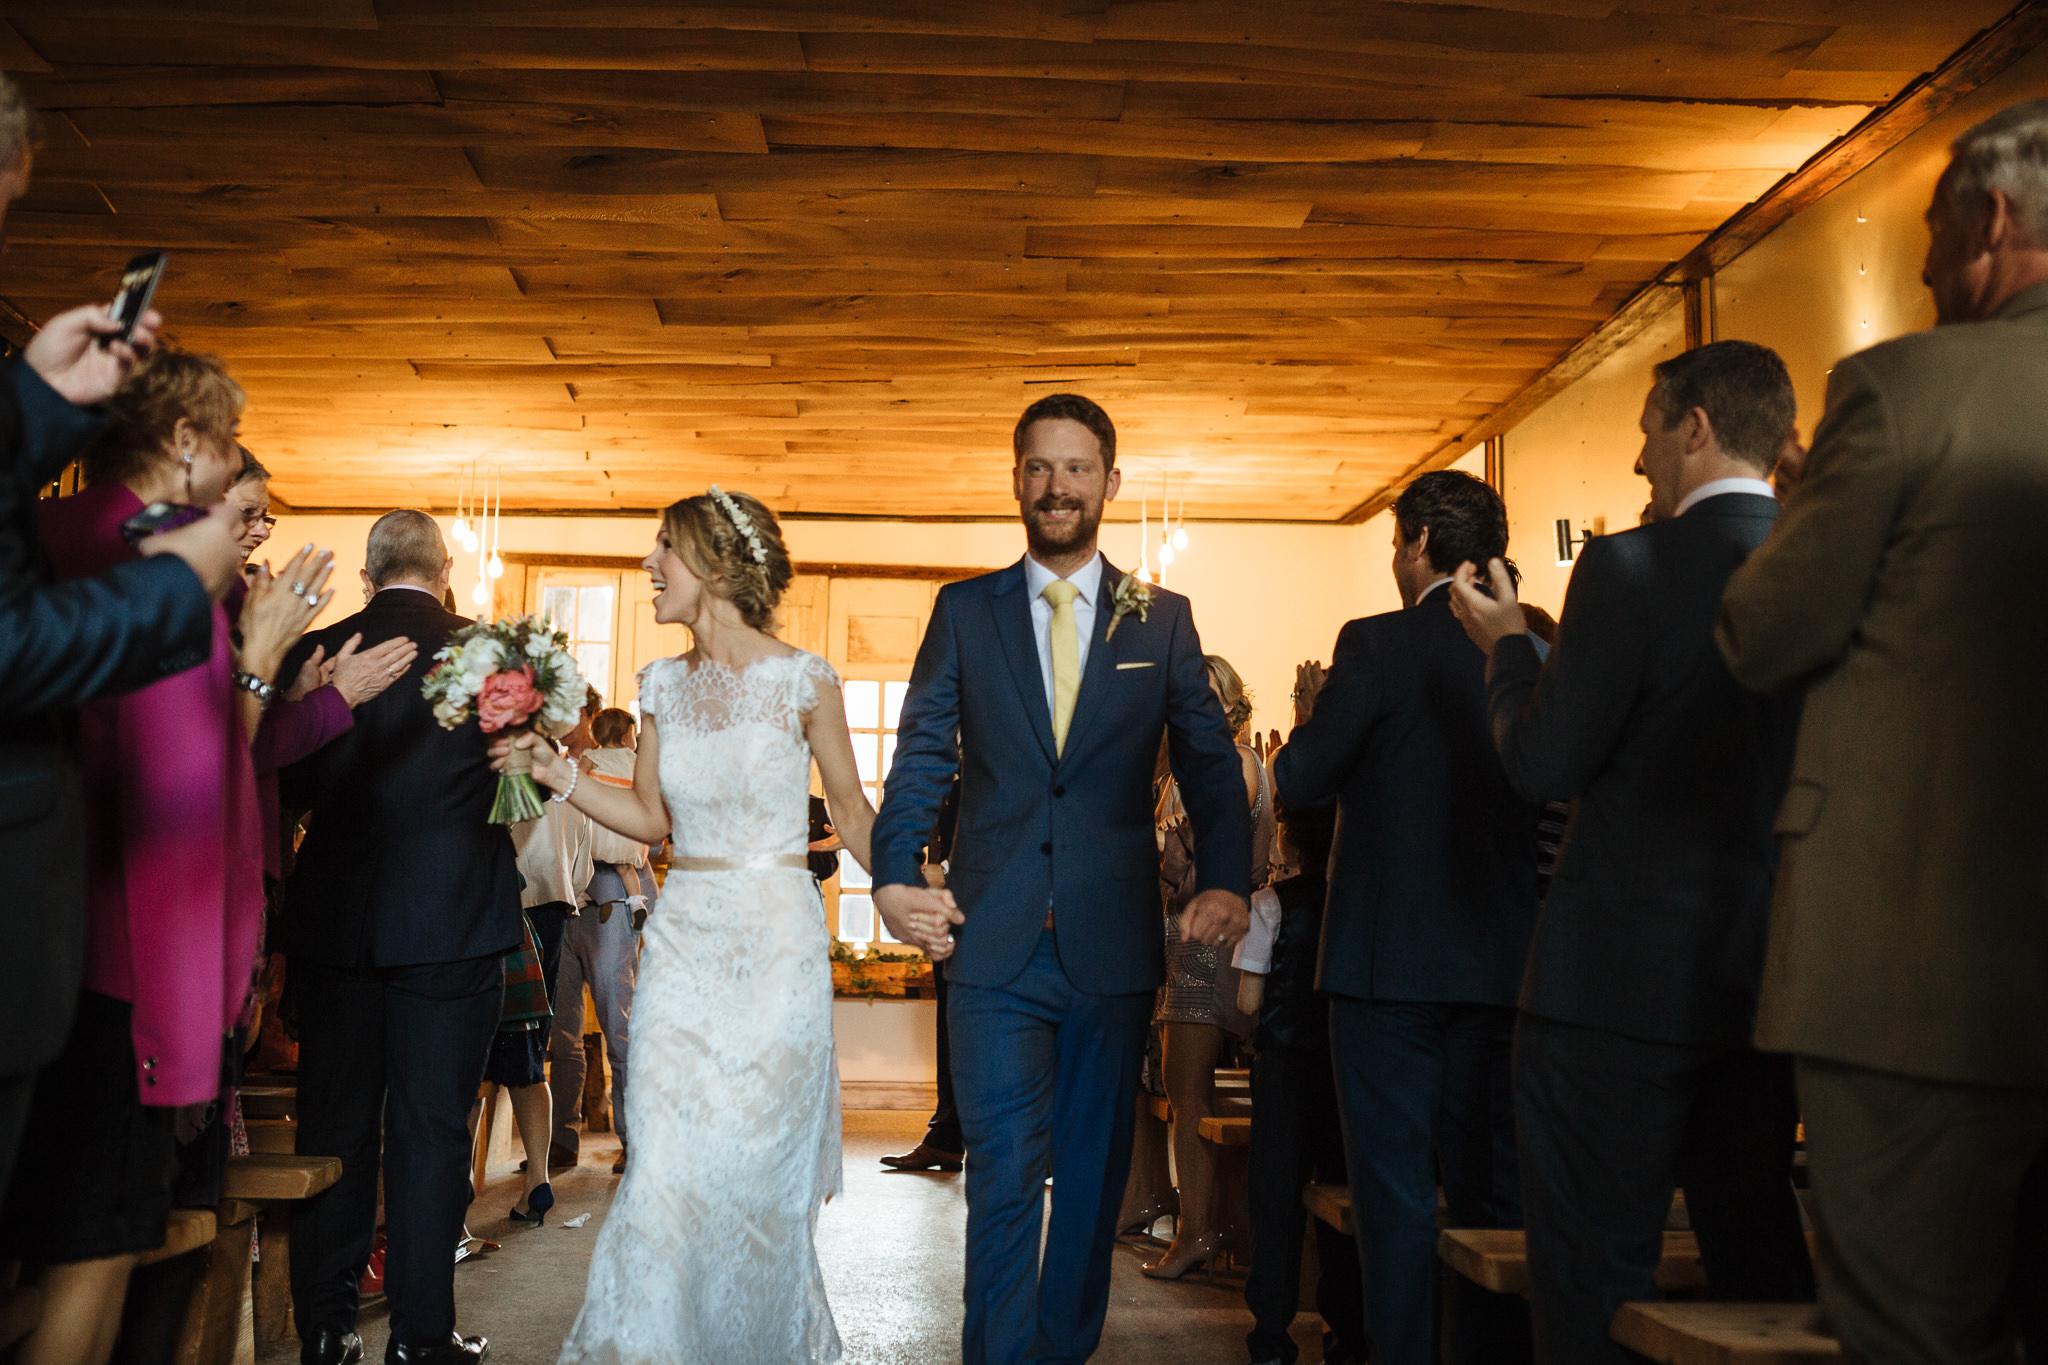 Owen-House-Barn-Wedding-Photographer-Cheshire-90042